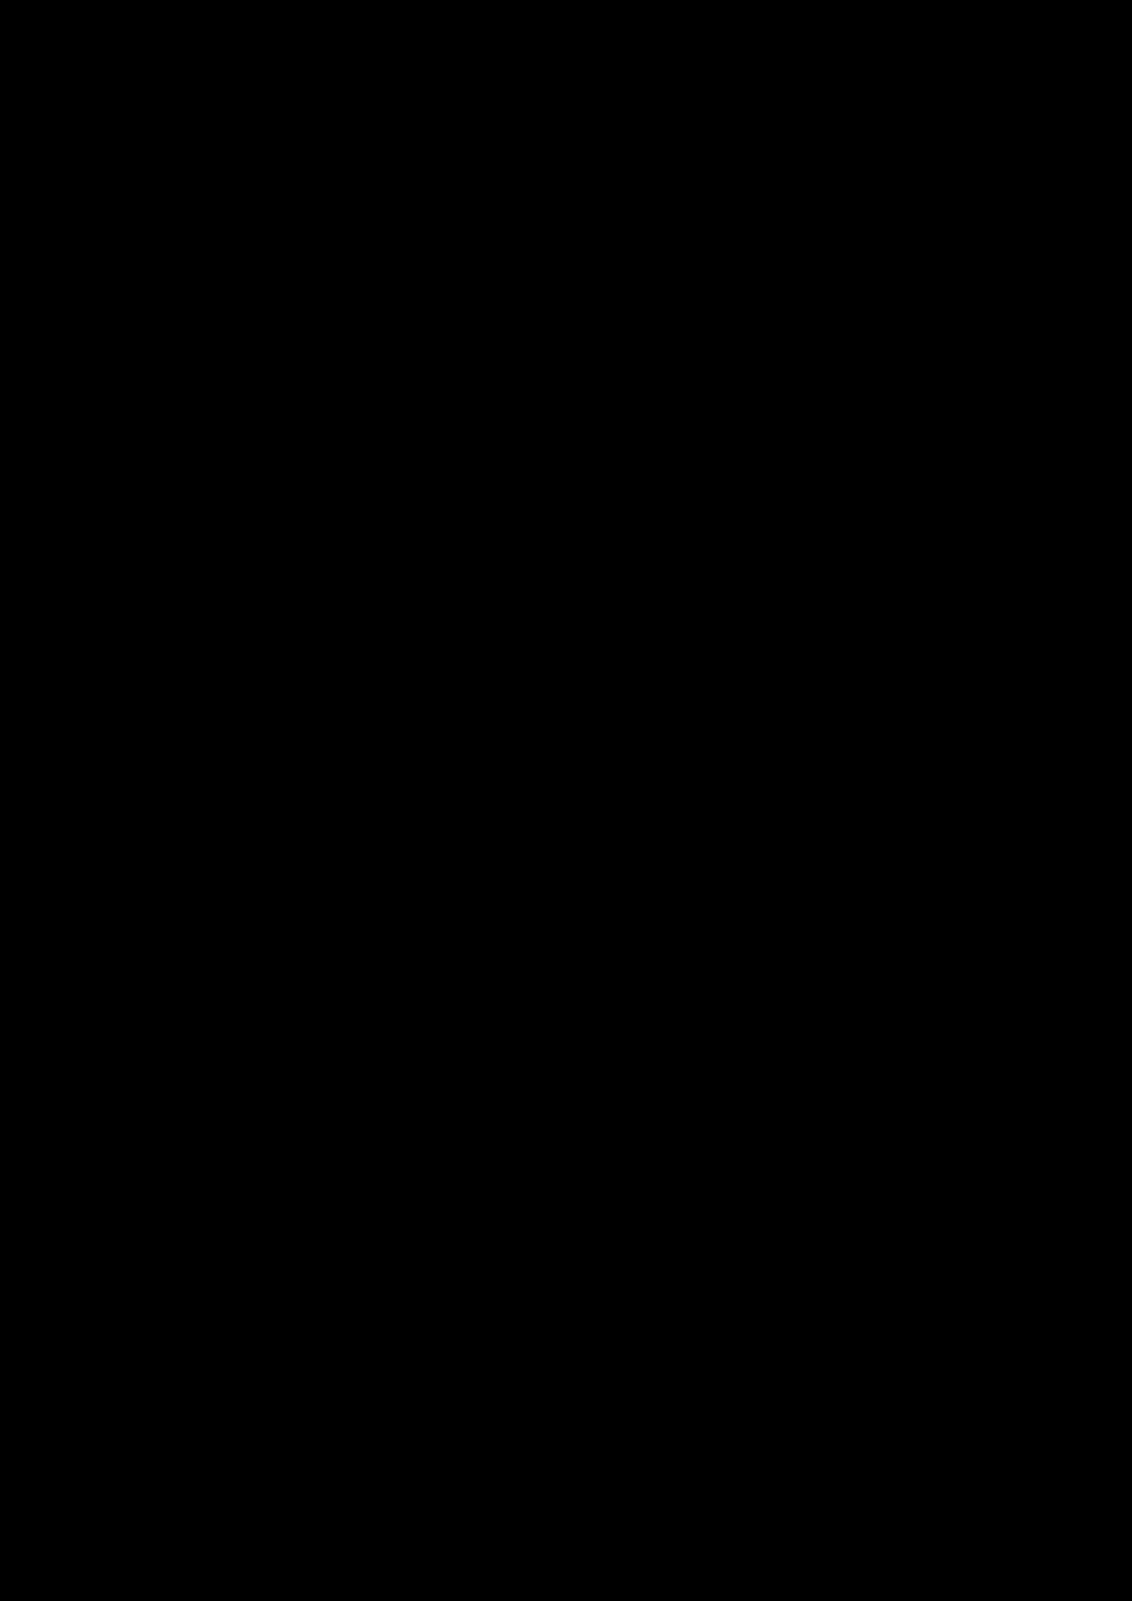 Okean Pustotyi slide, Image 55